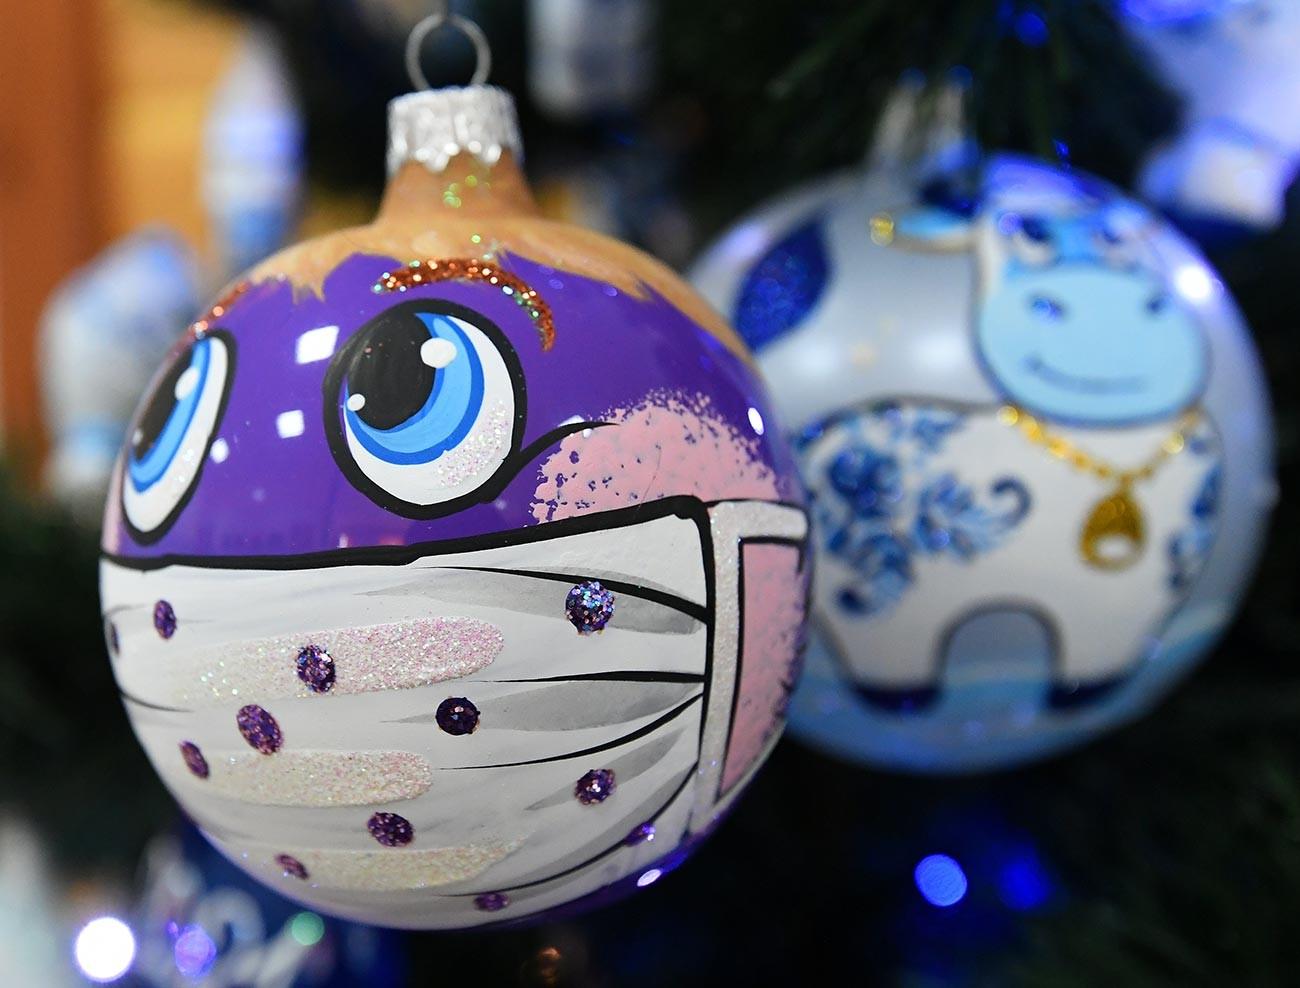 Christmas tree ornaments with masks from Krasnoyarsk.